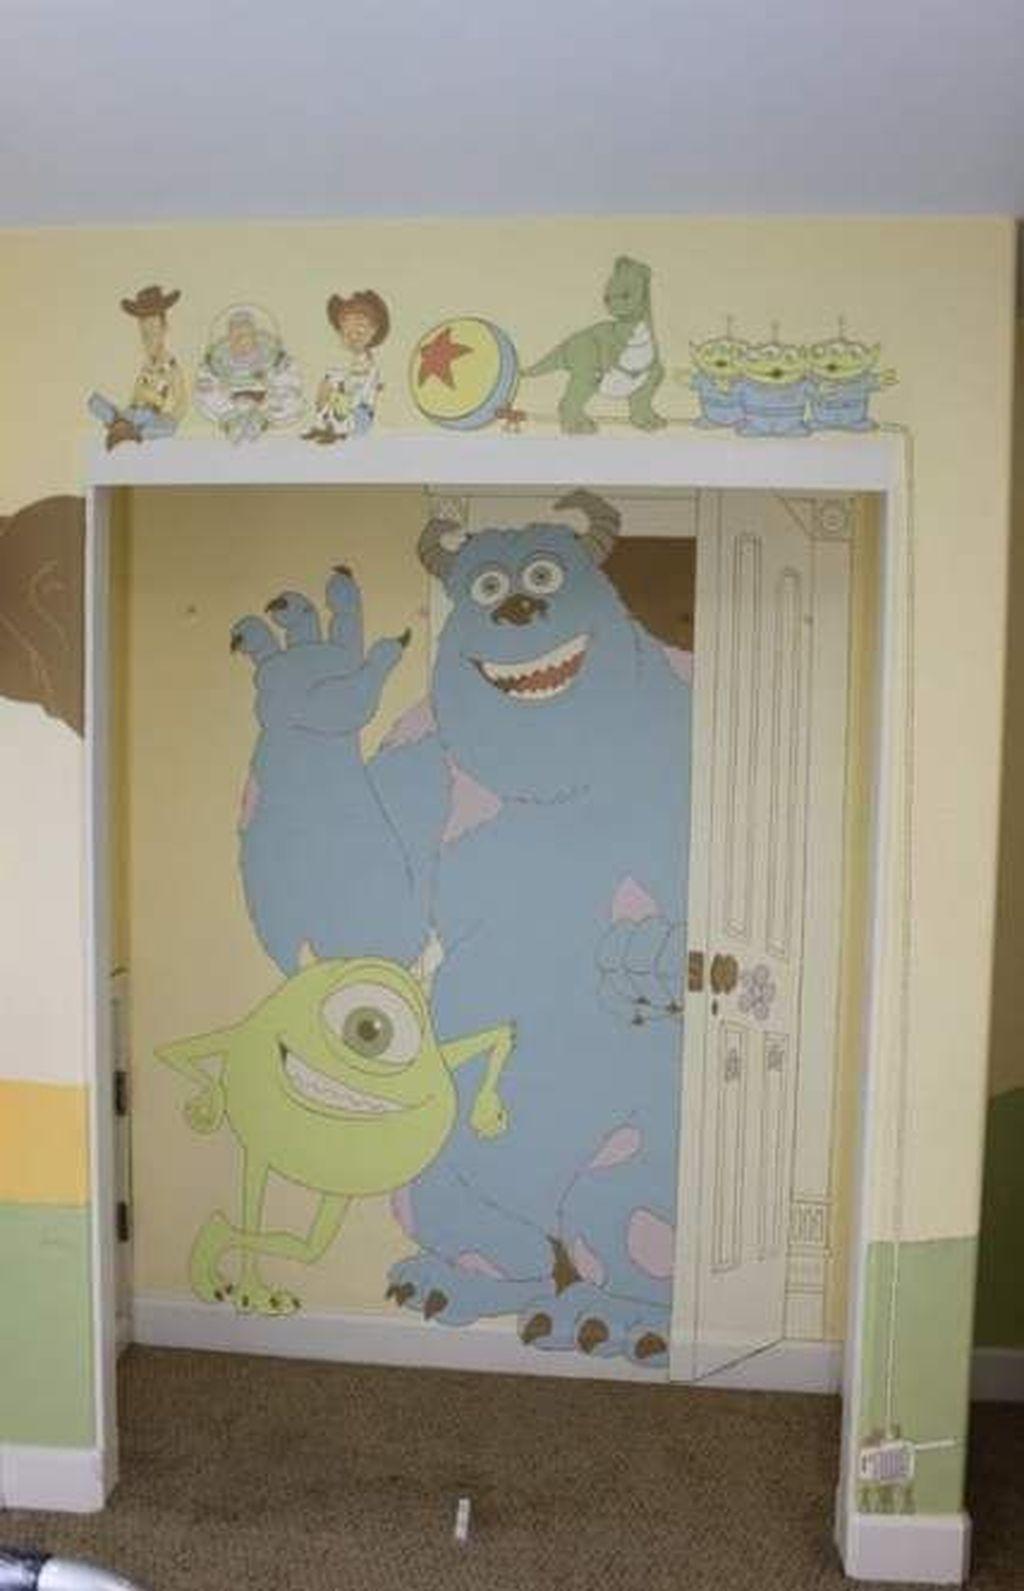 Adorable Disney Room Design Ideas For Your Childrens Room 15